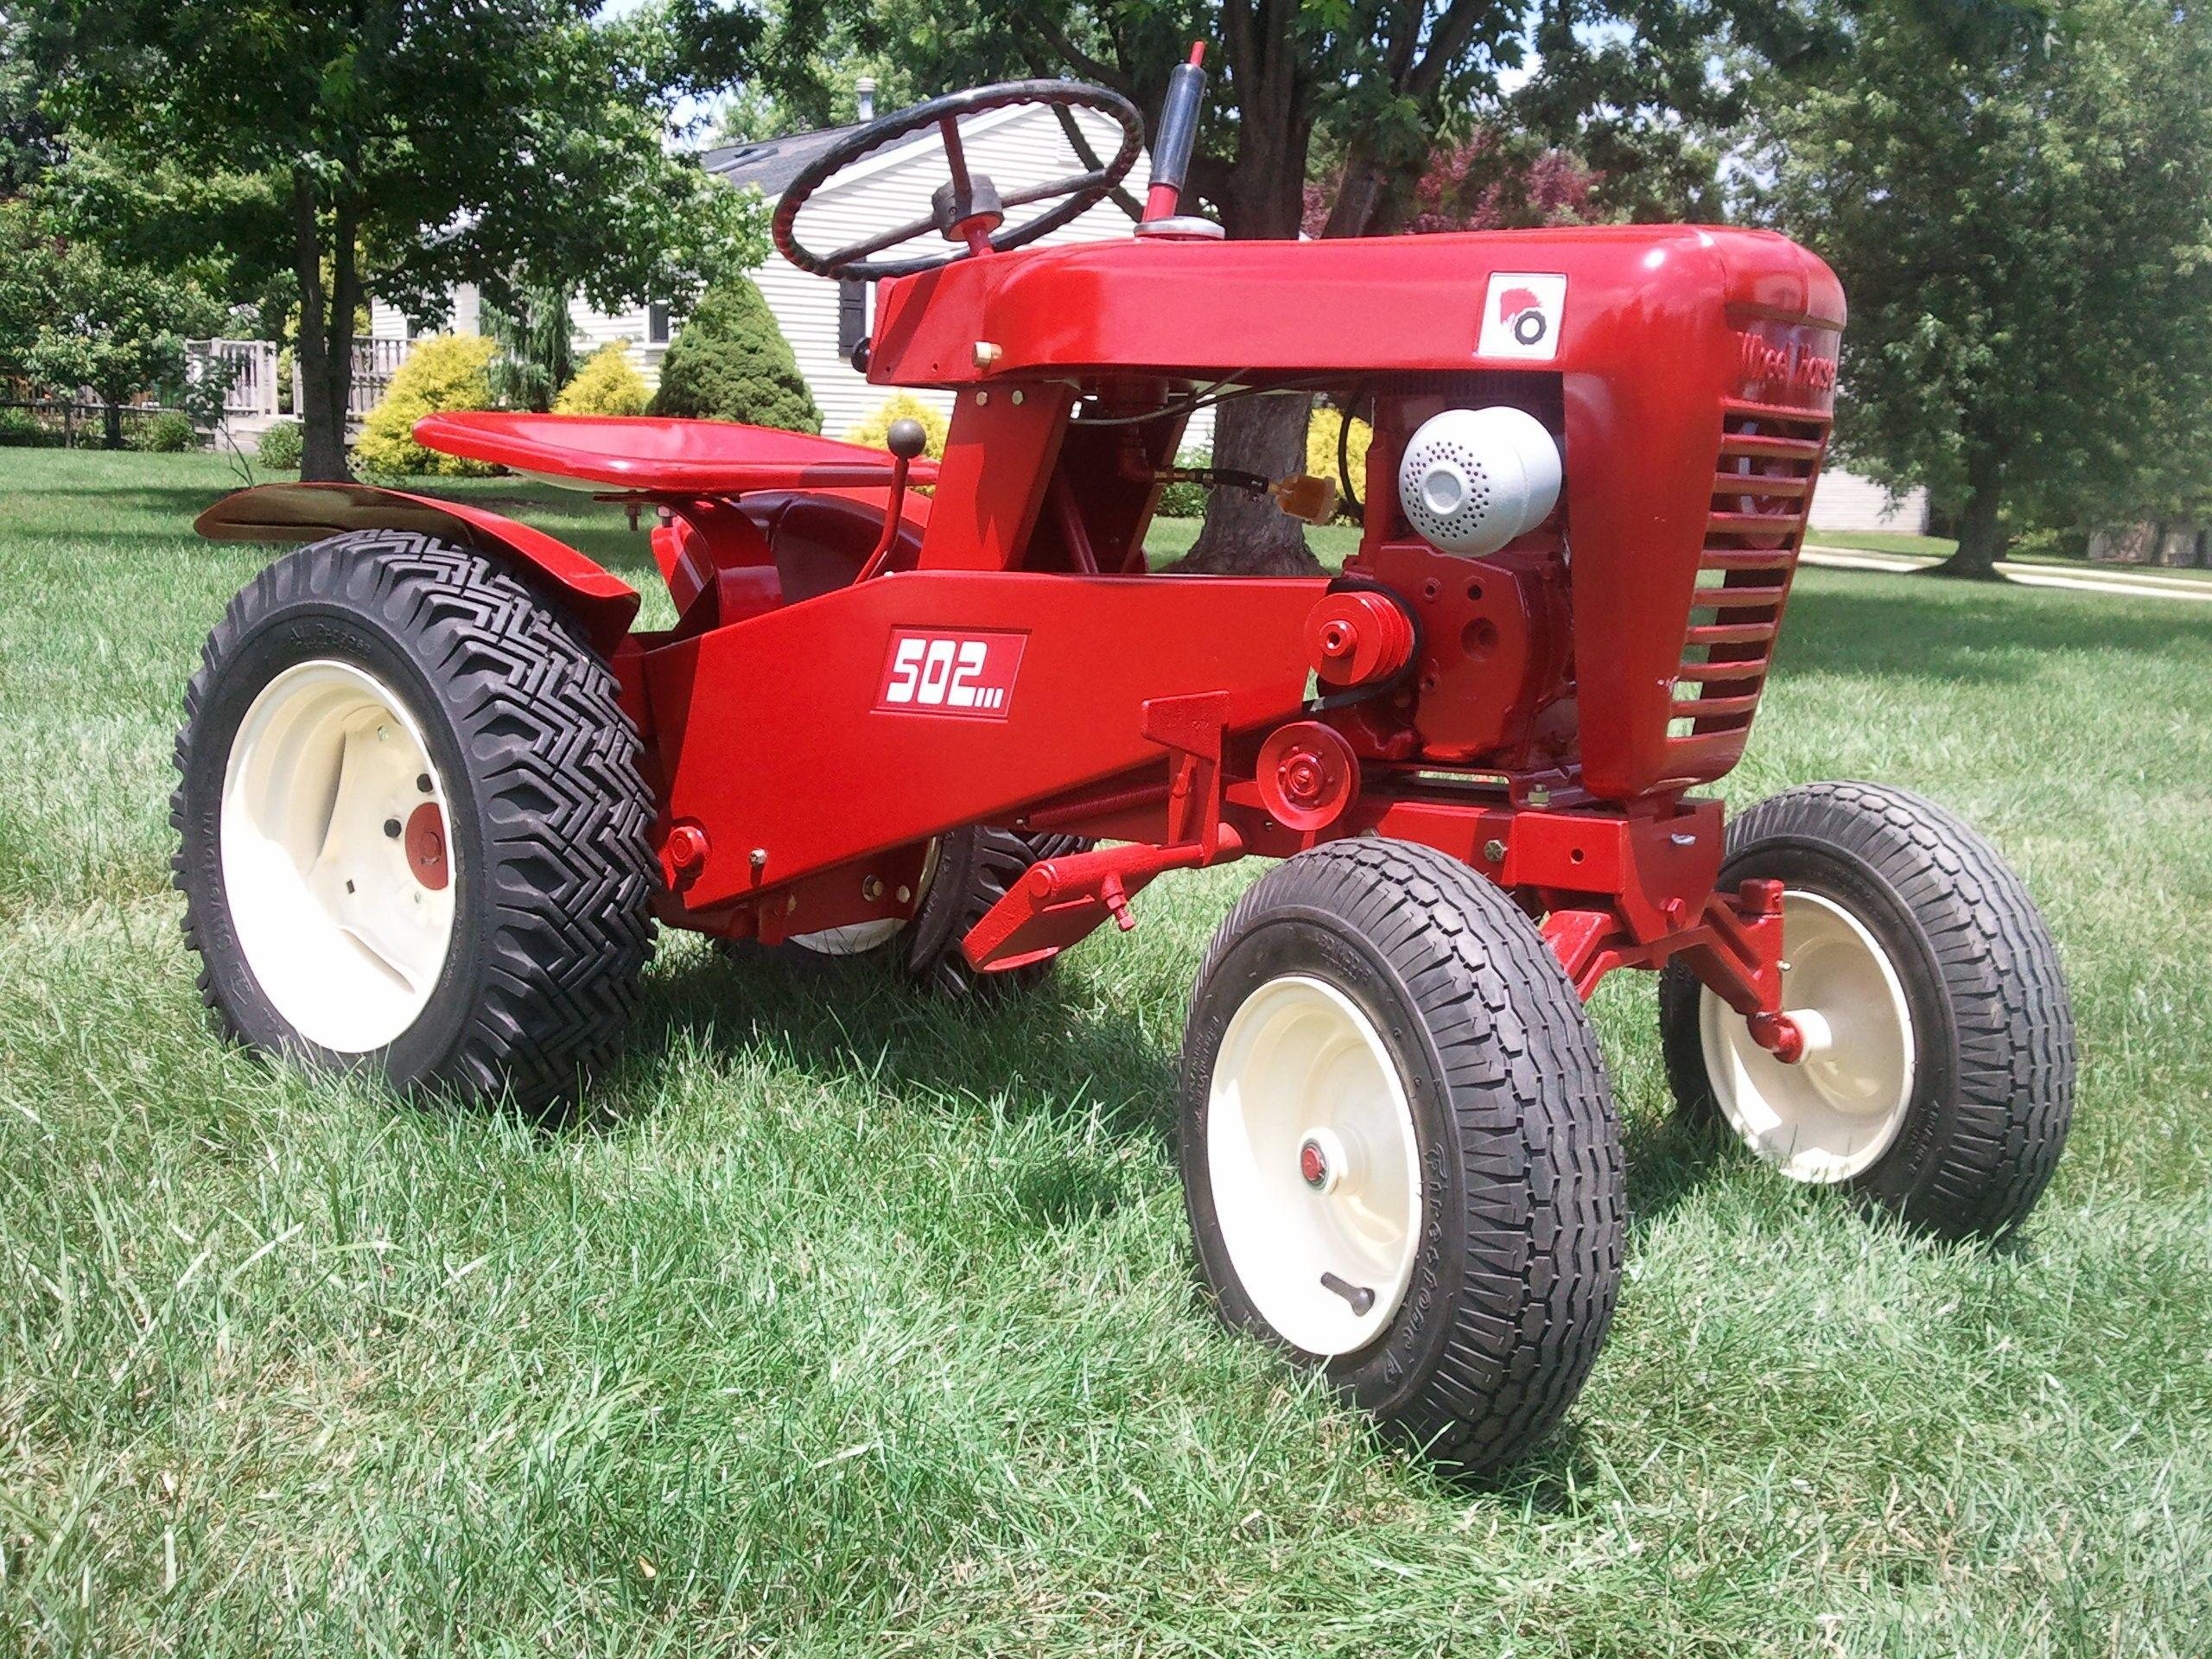 Wiring Diagram Wheel Horse Lawn Tractor Whirlpool Refrigerator 1962 502 Tractors Pinterest